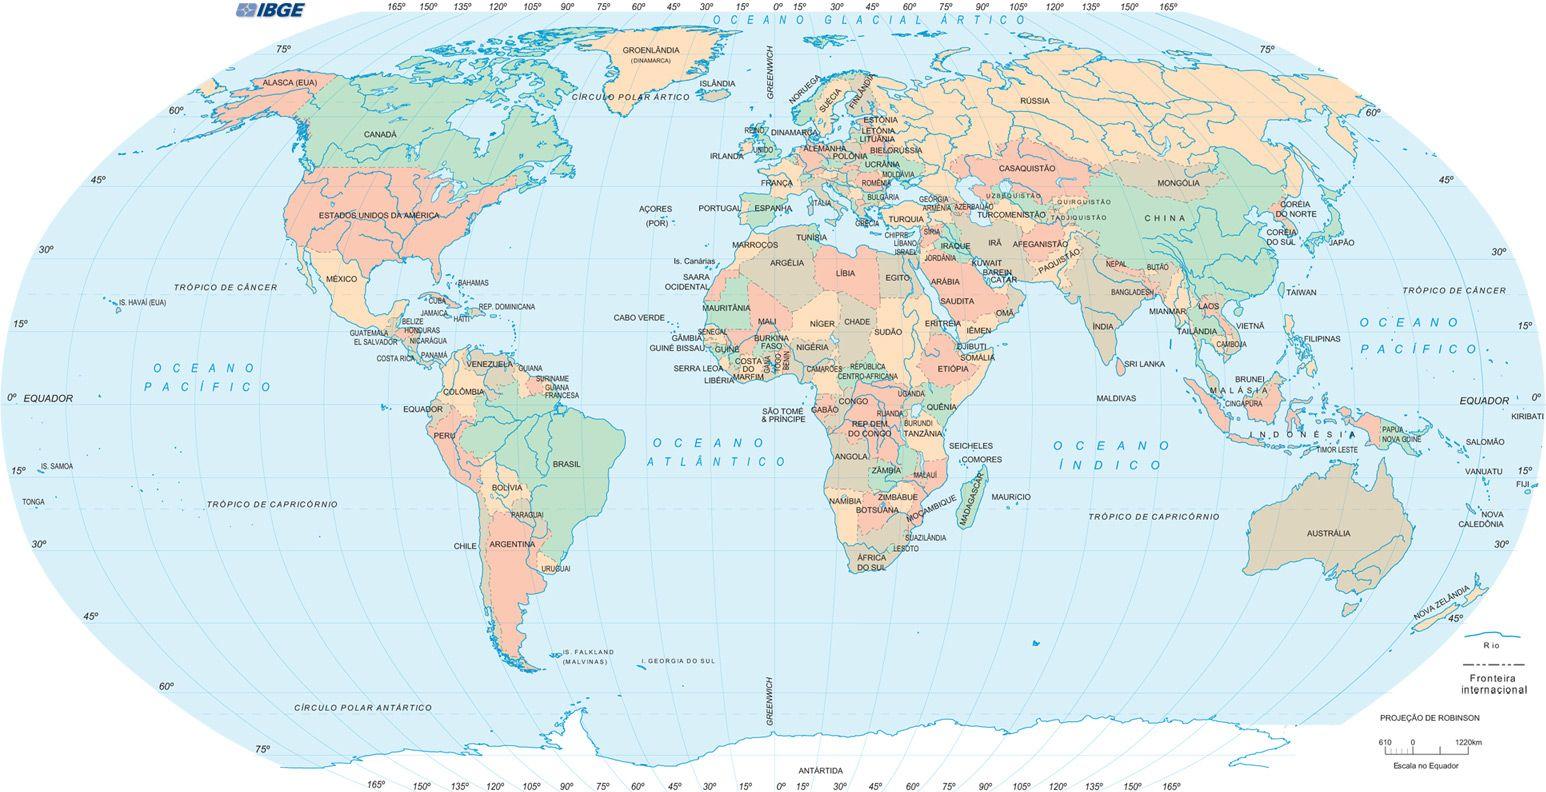 10 Atividades Sobre Continente Africano Mapa Mundi Imagem Mapa Mundi Mapa Mundi Politico